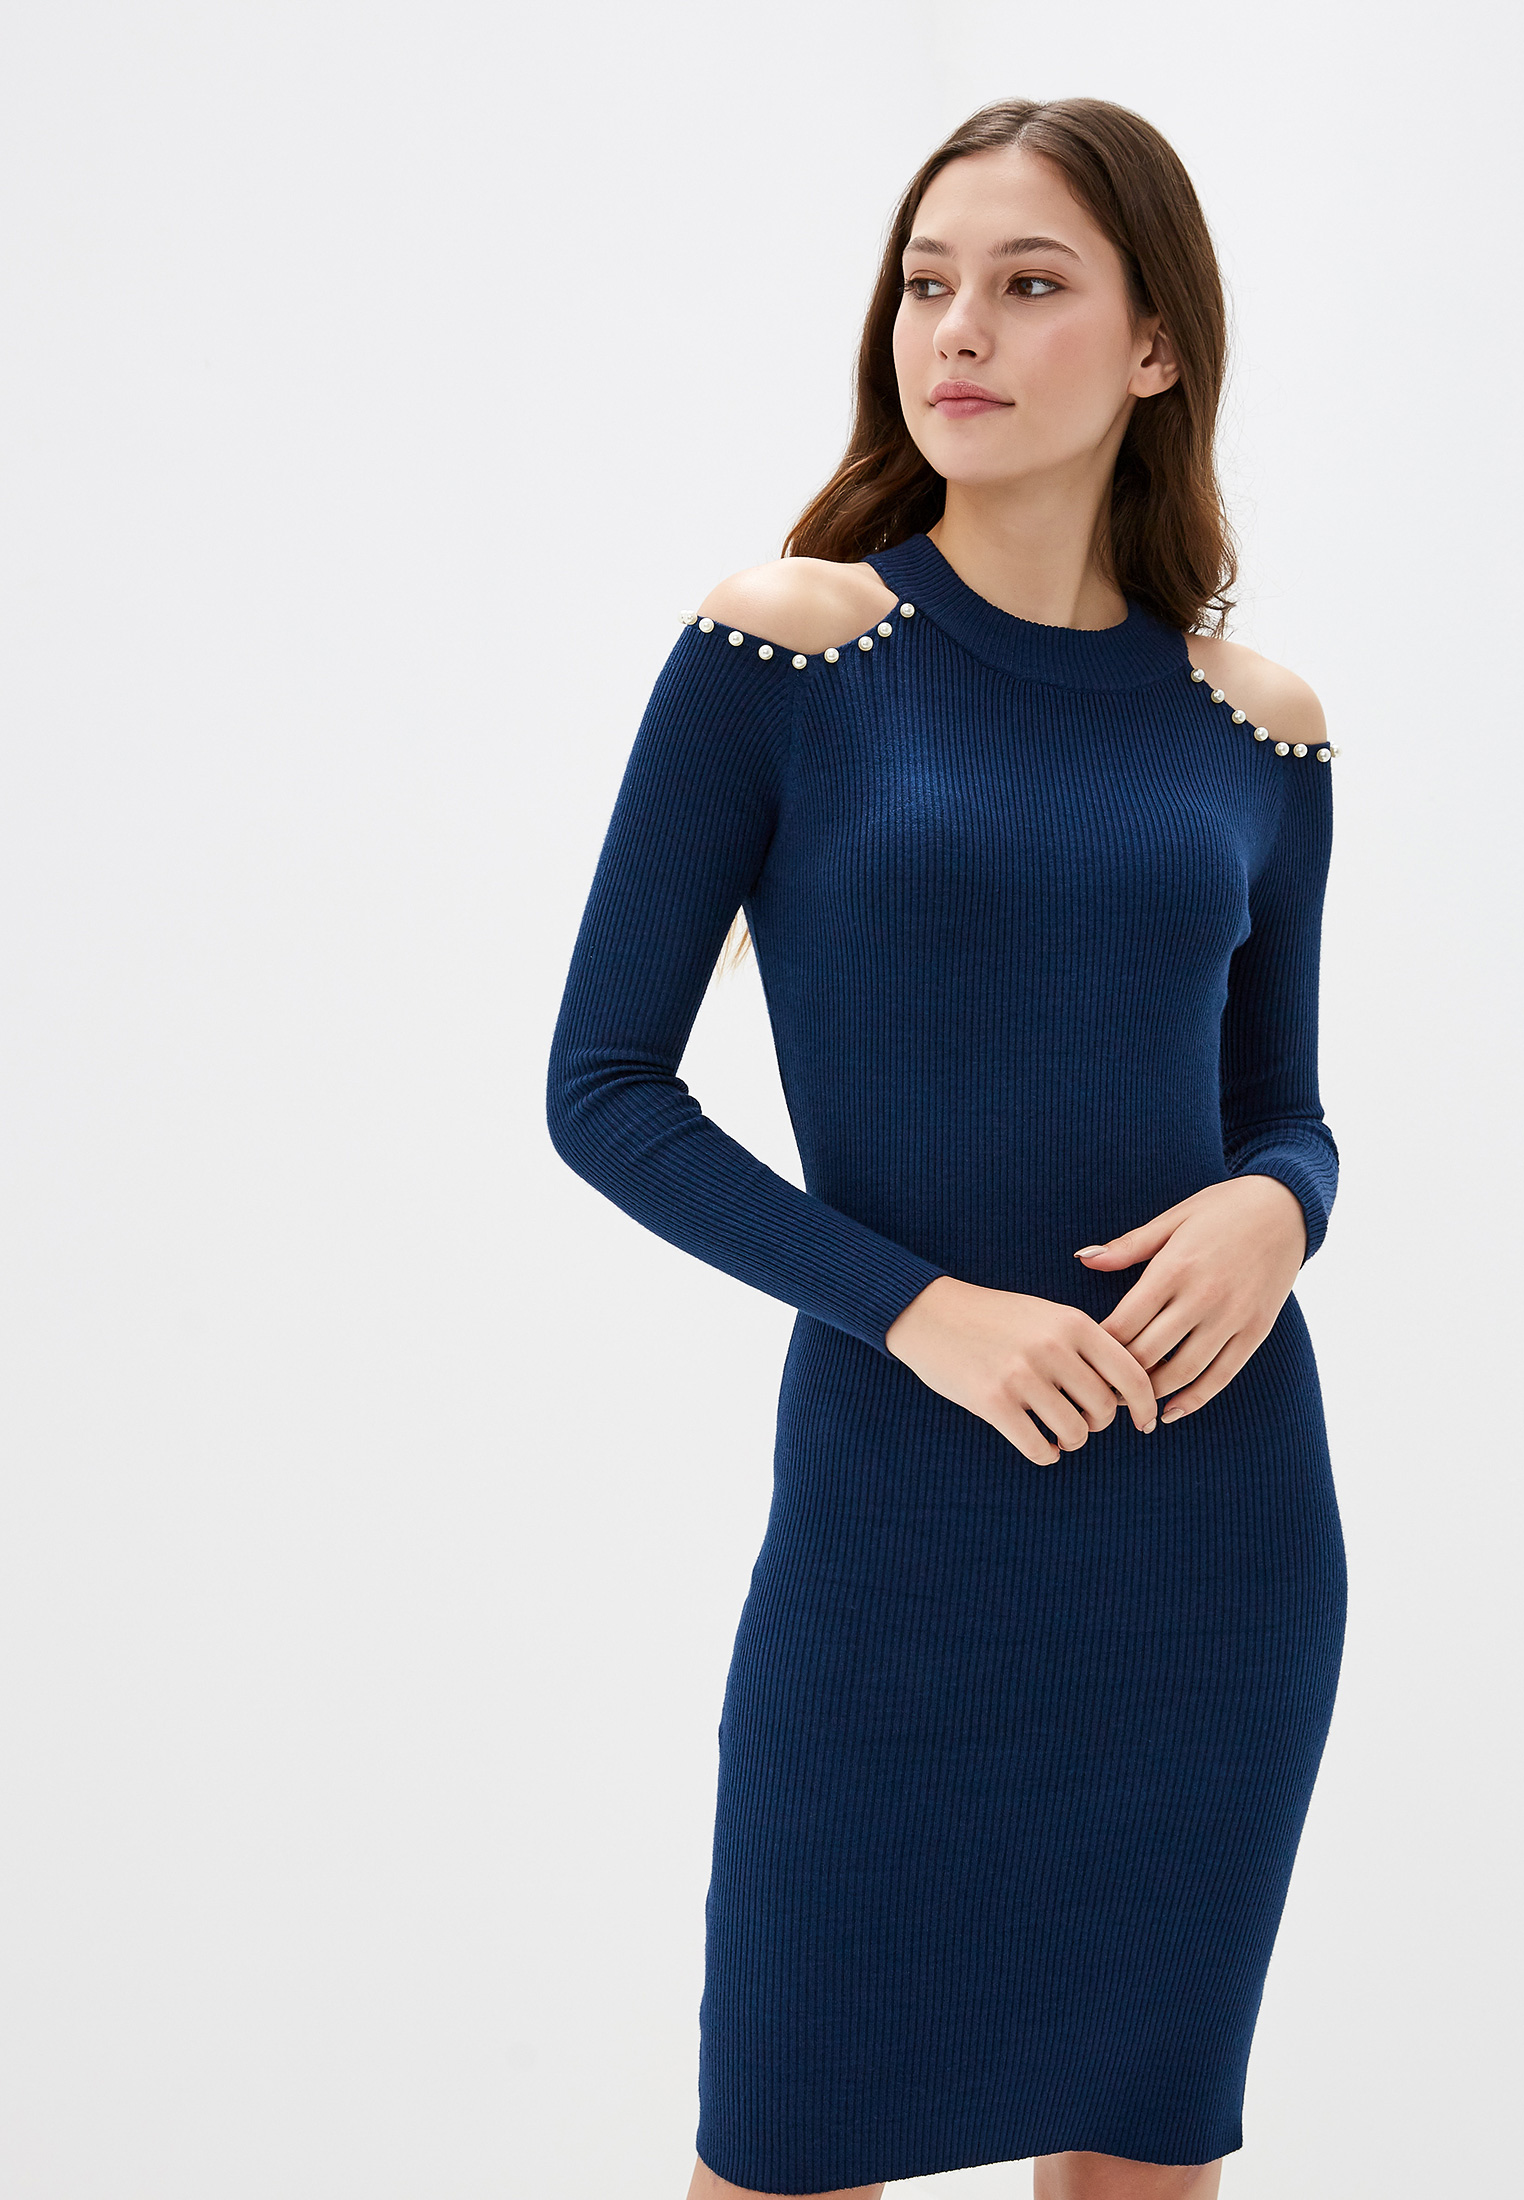 Вязаное платье Liana L605